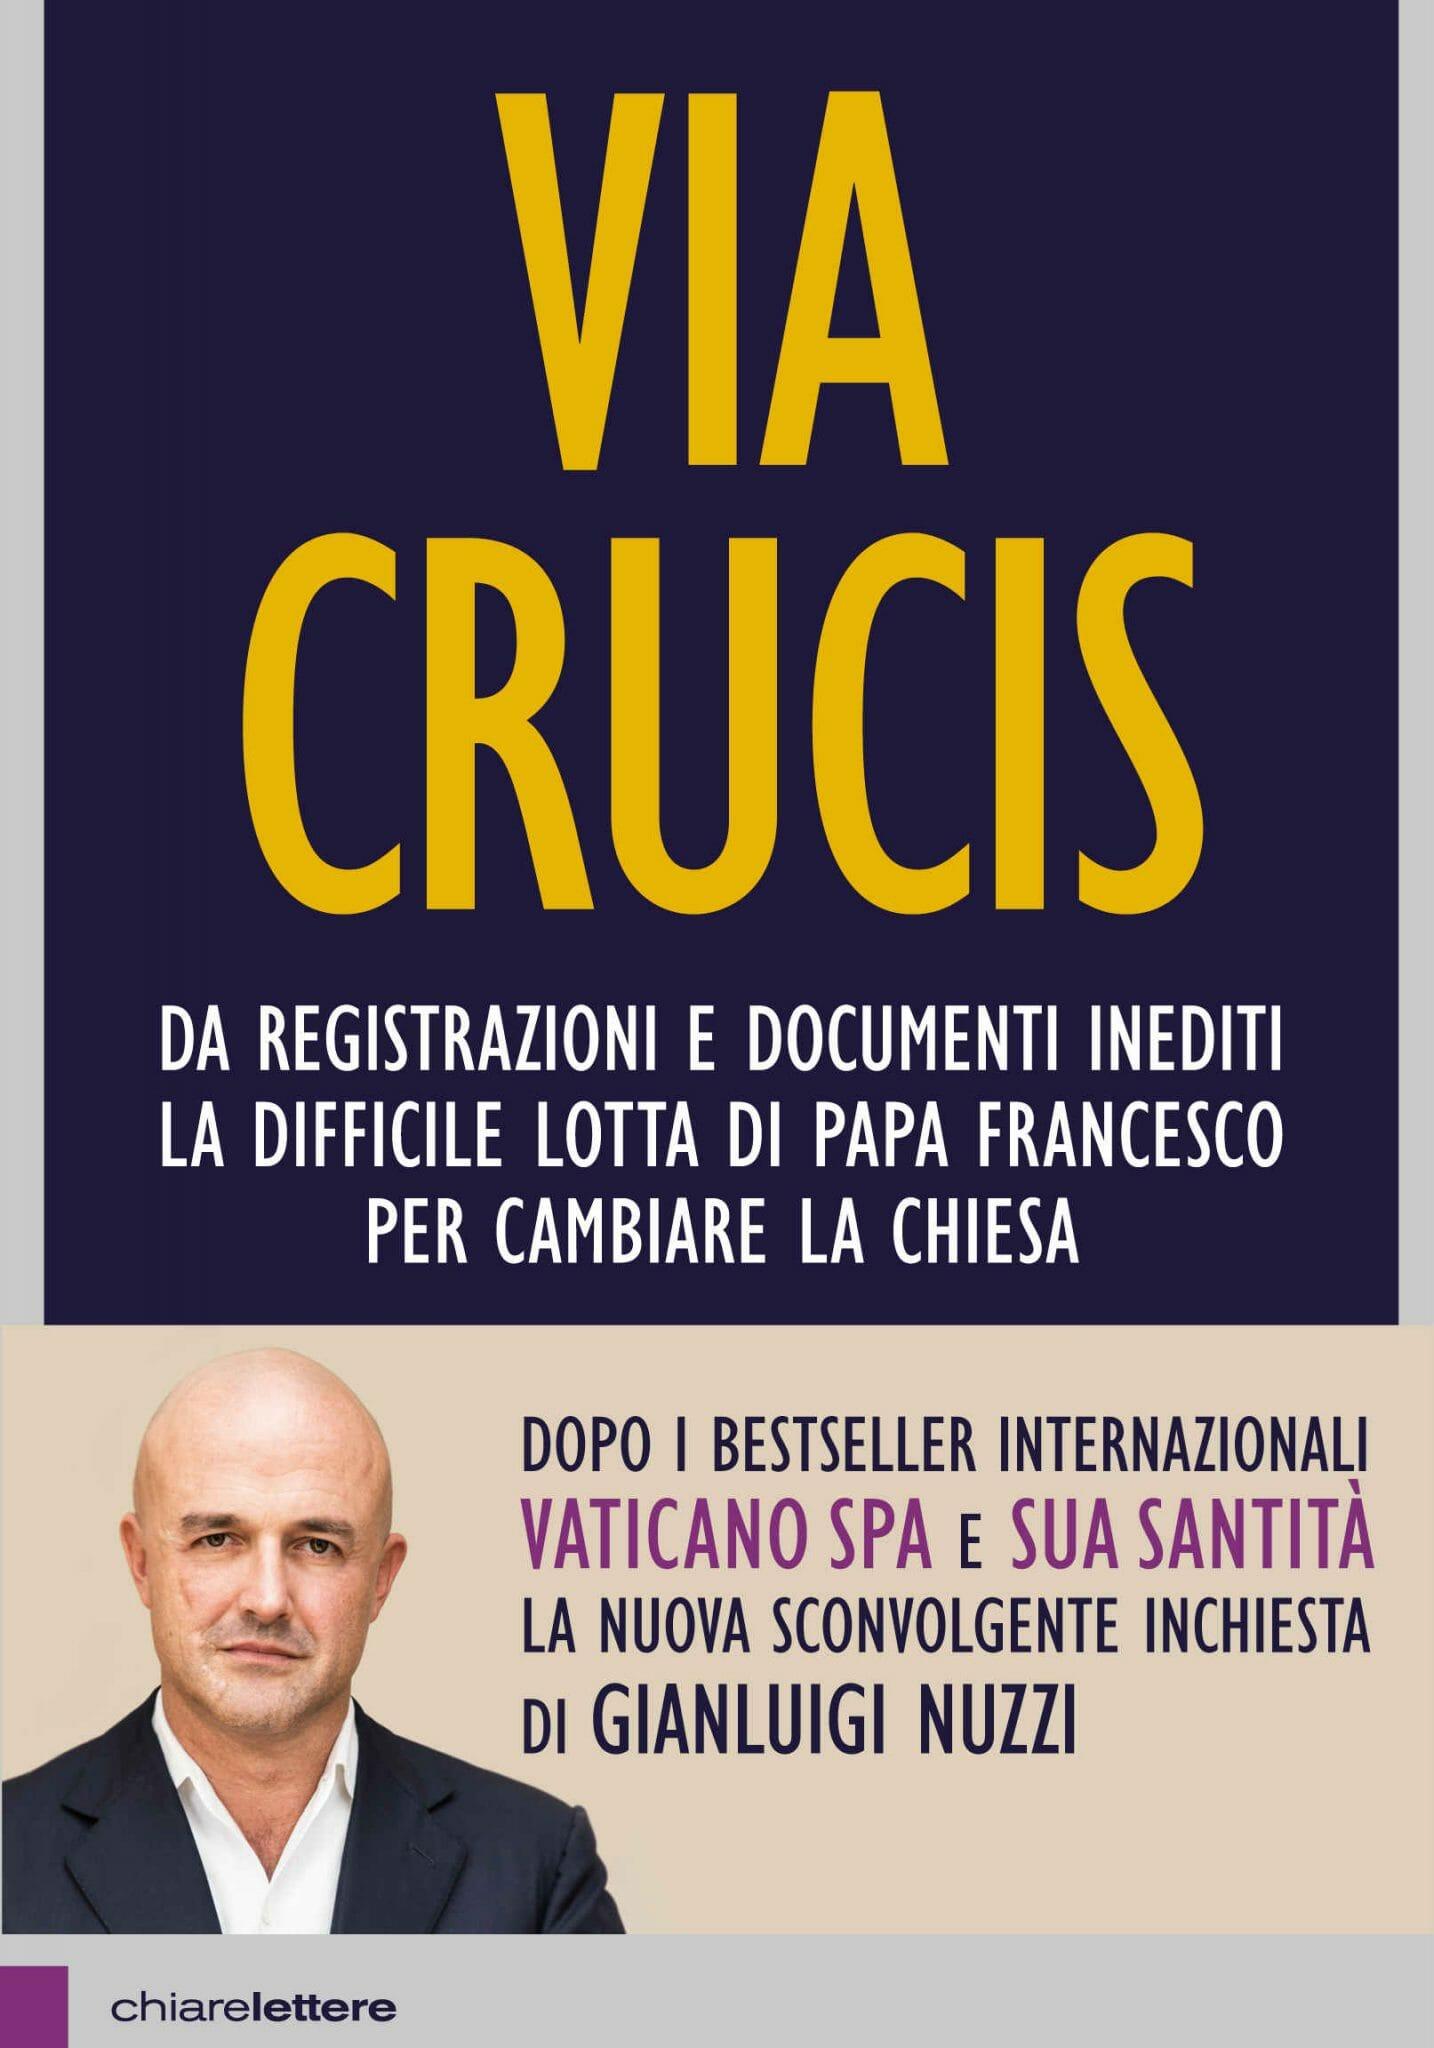 Nuzzi_VIACRUCIS